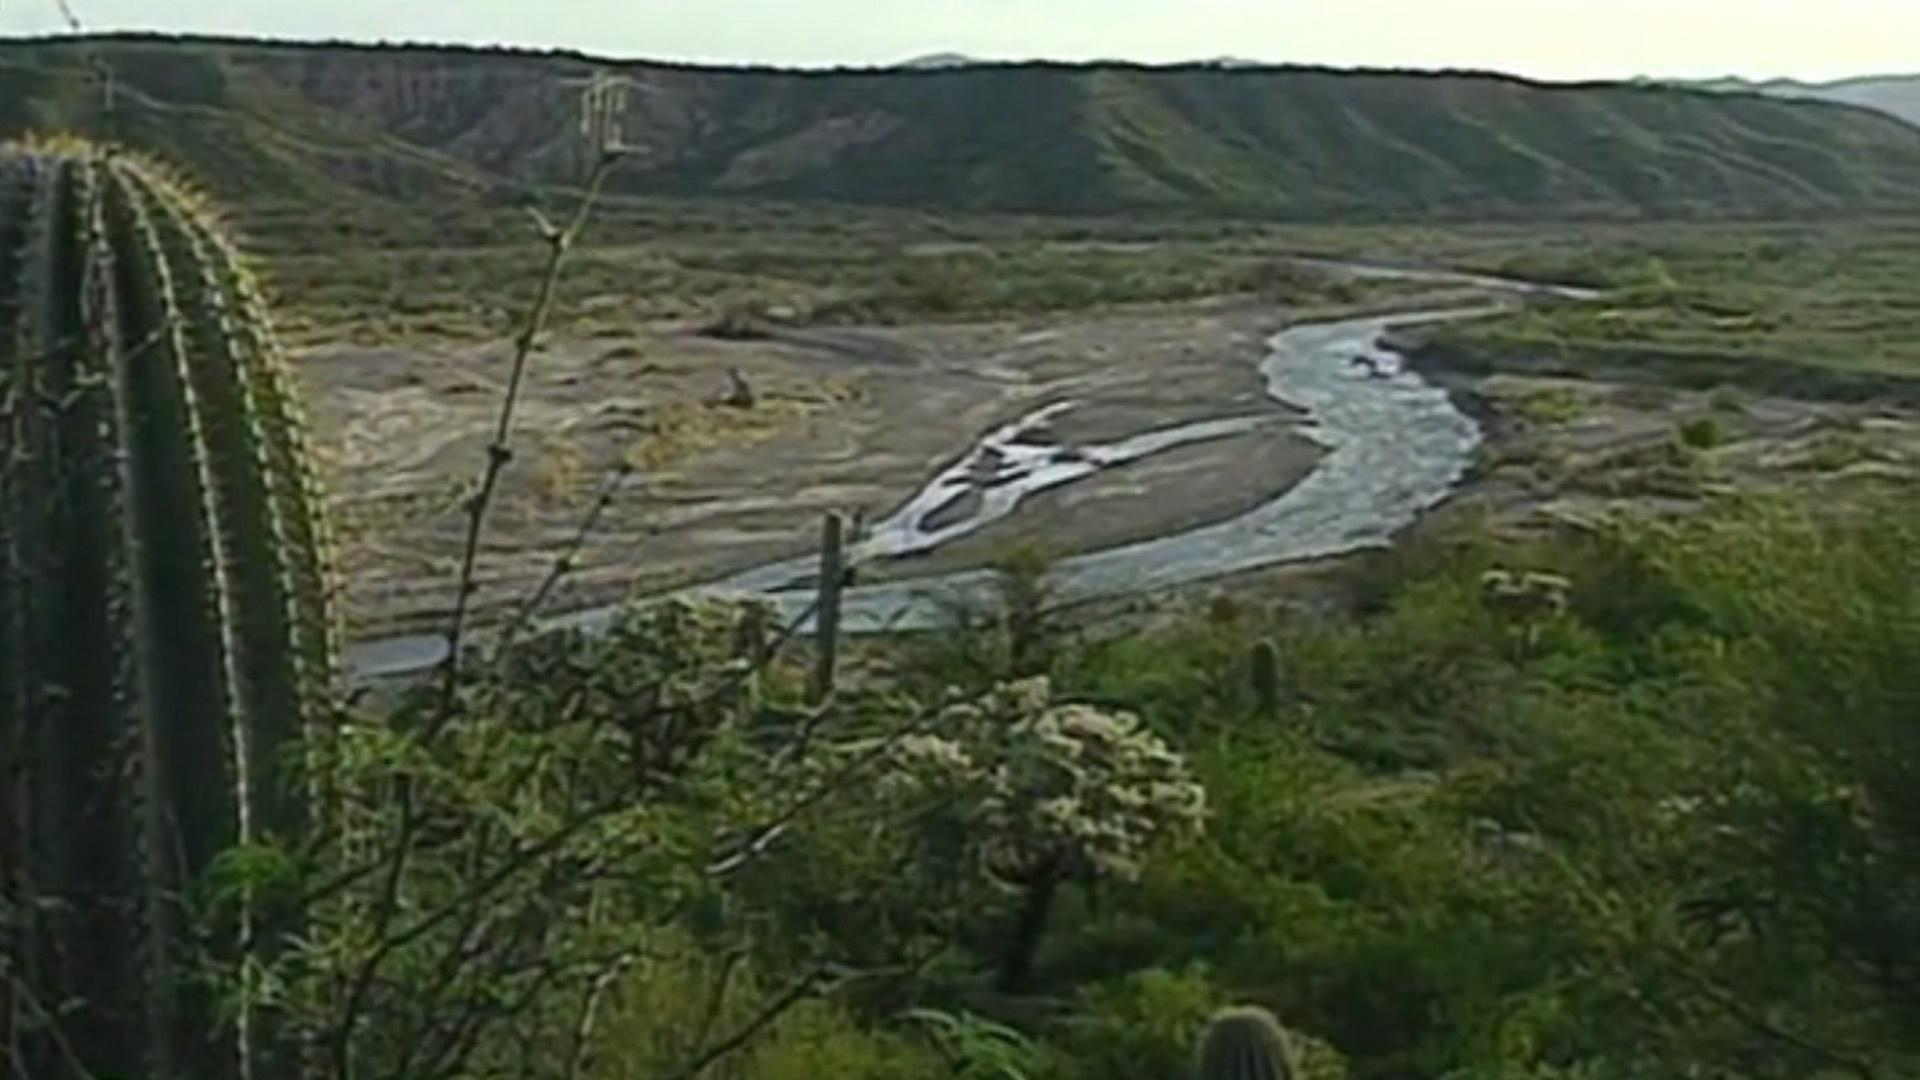 Season 2, Episode 3: Desert Riparian Areas